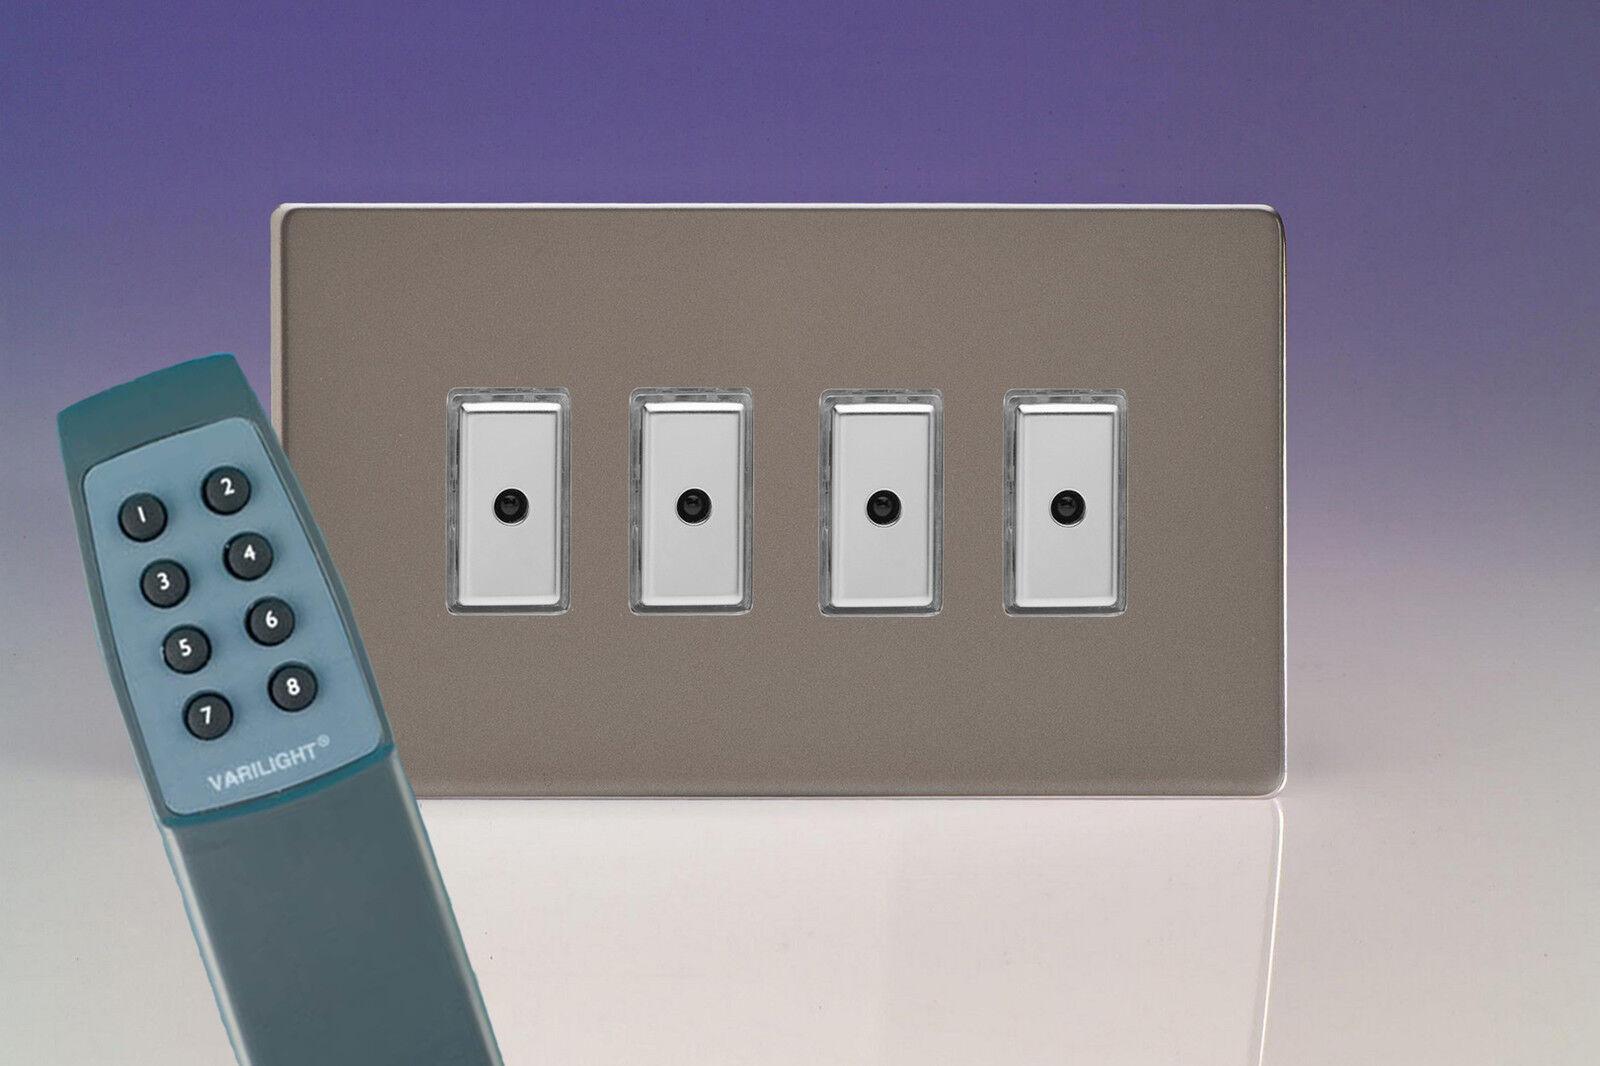 Varilight 4 Gang 1-Way TELECOMANDO TATTILE Touch Control MASTER LED LED LED dimmer luce Svizzera 76df3a